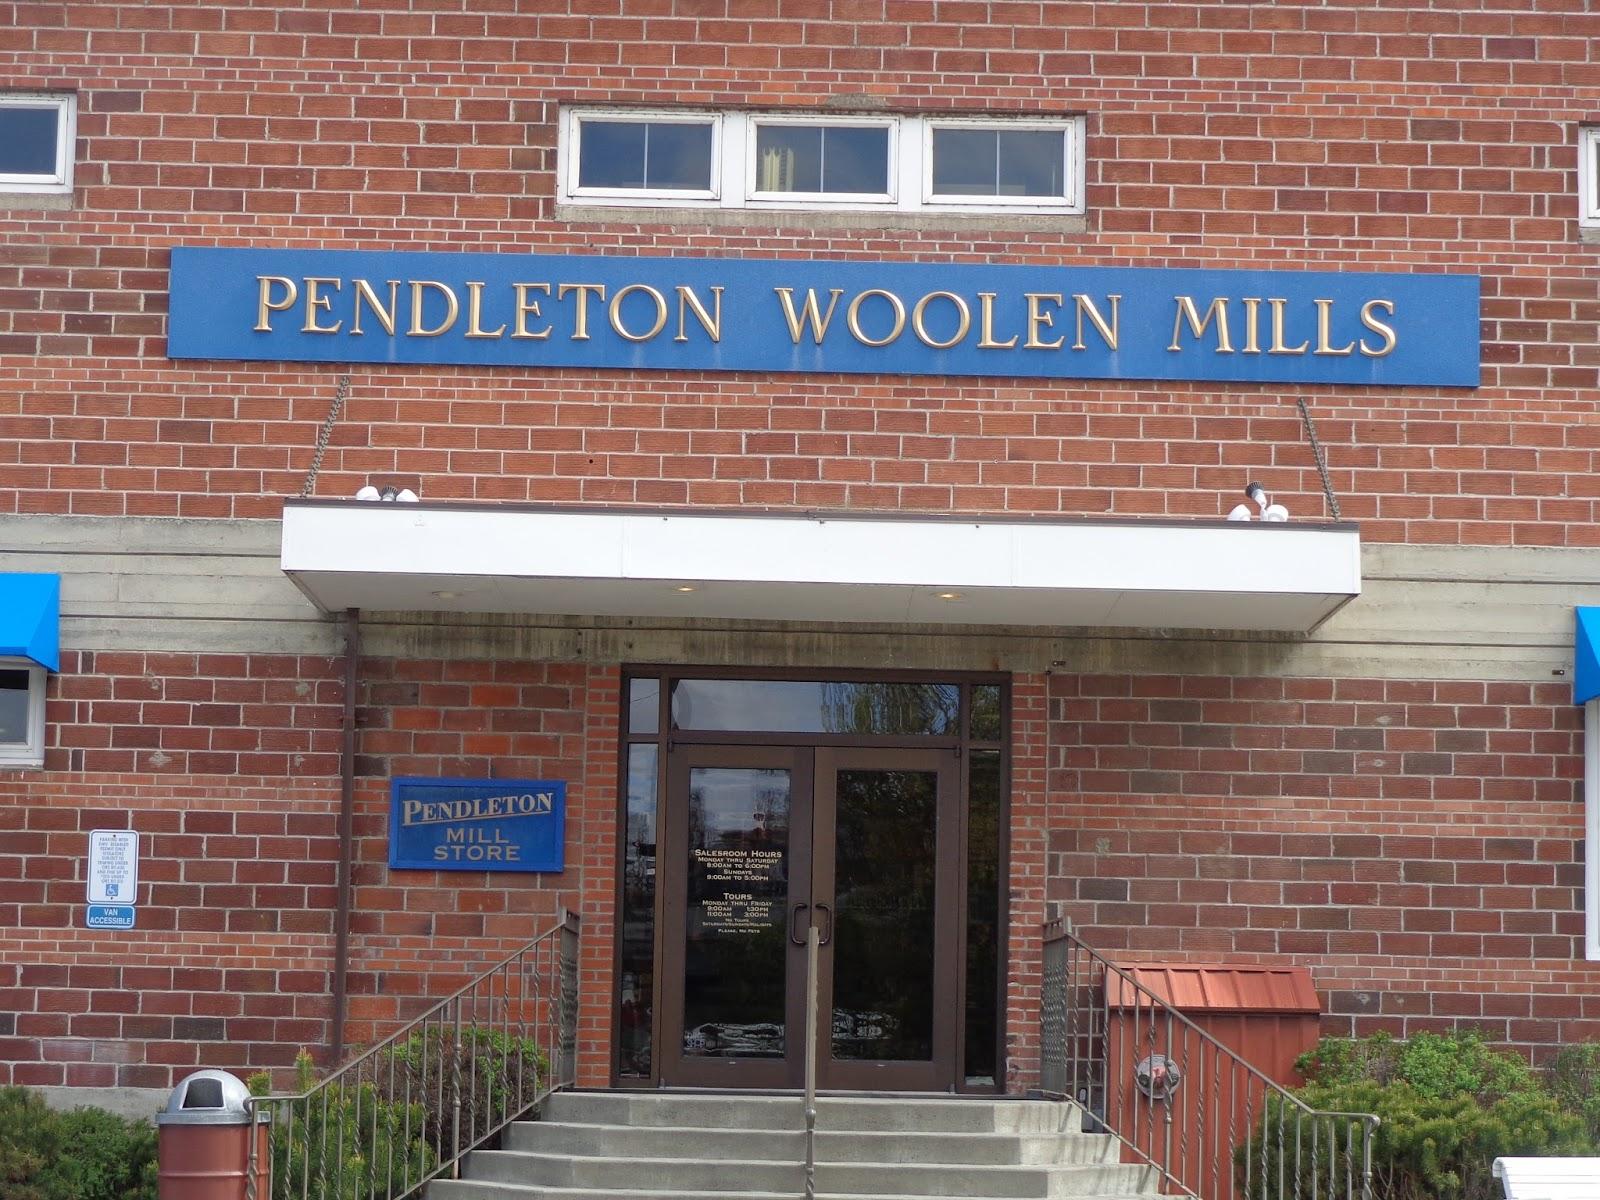 timeless reflections: Pendleton Woolen Mills on